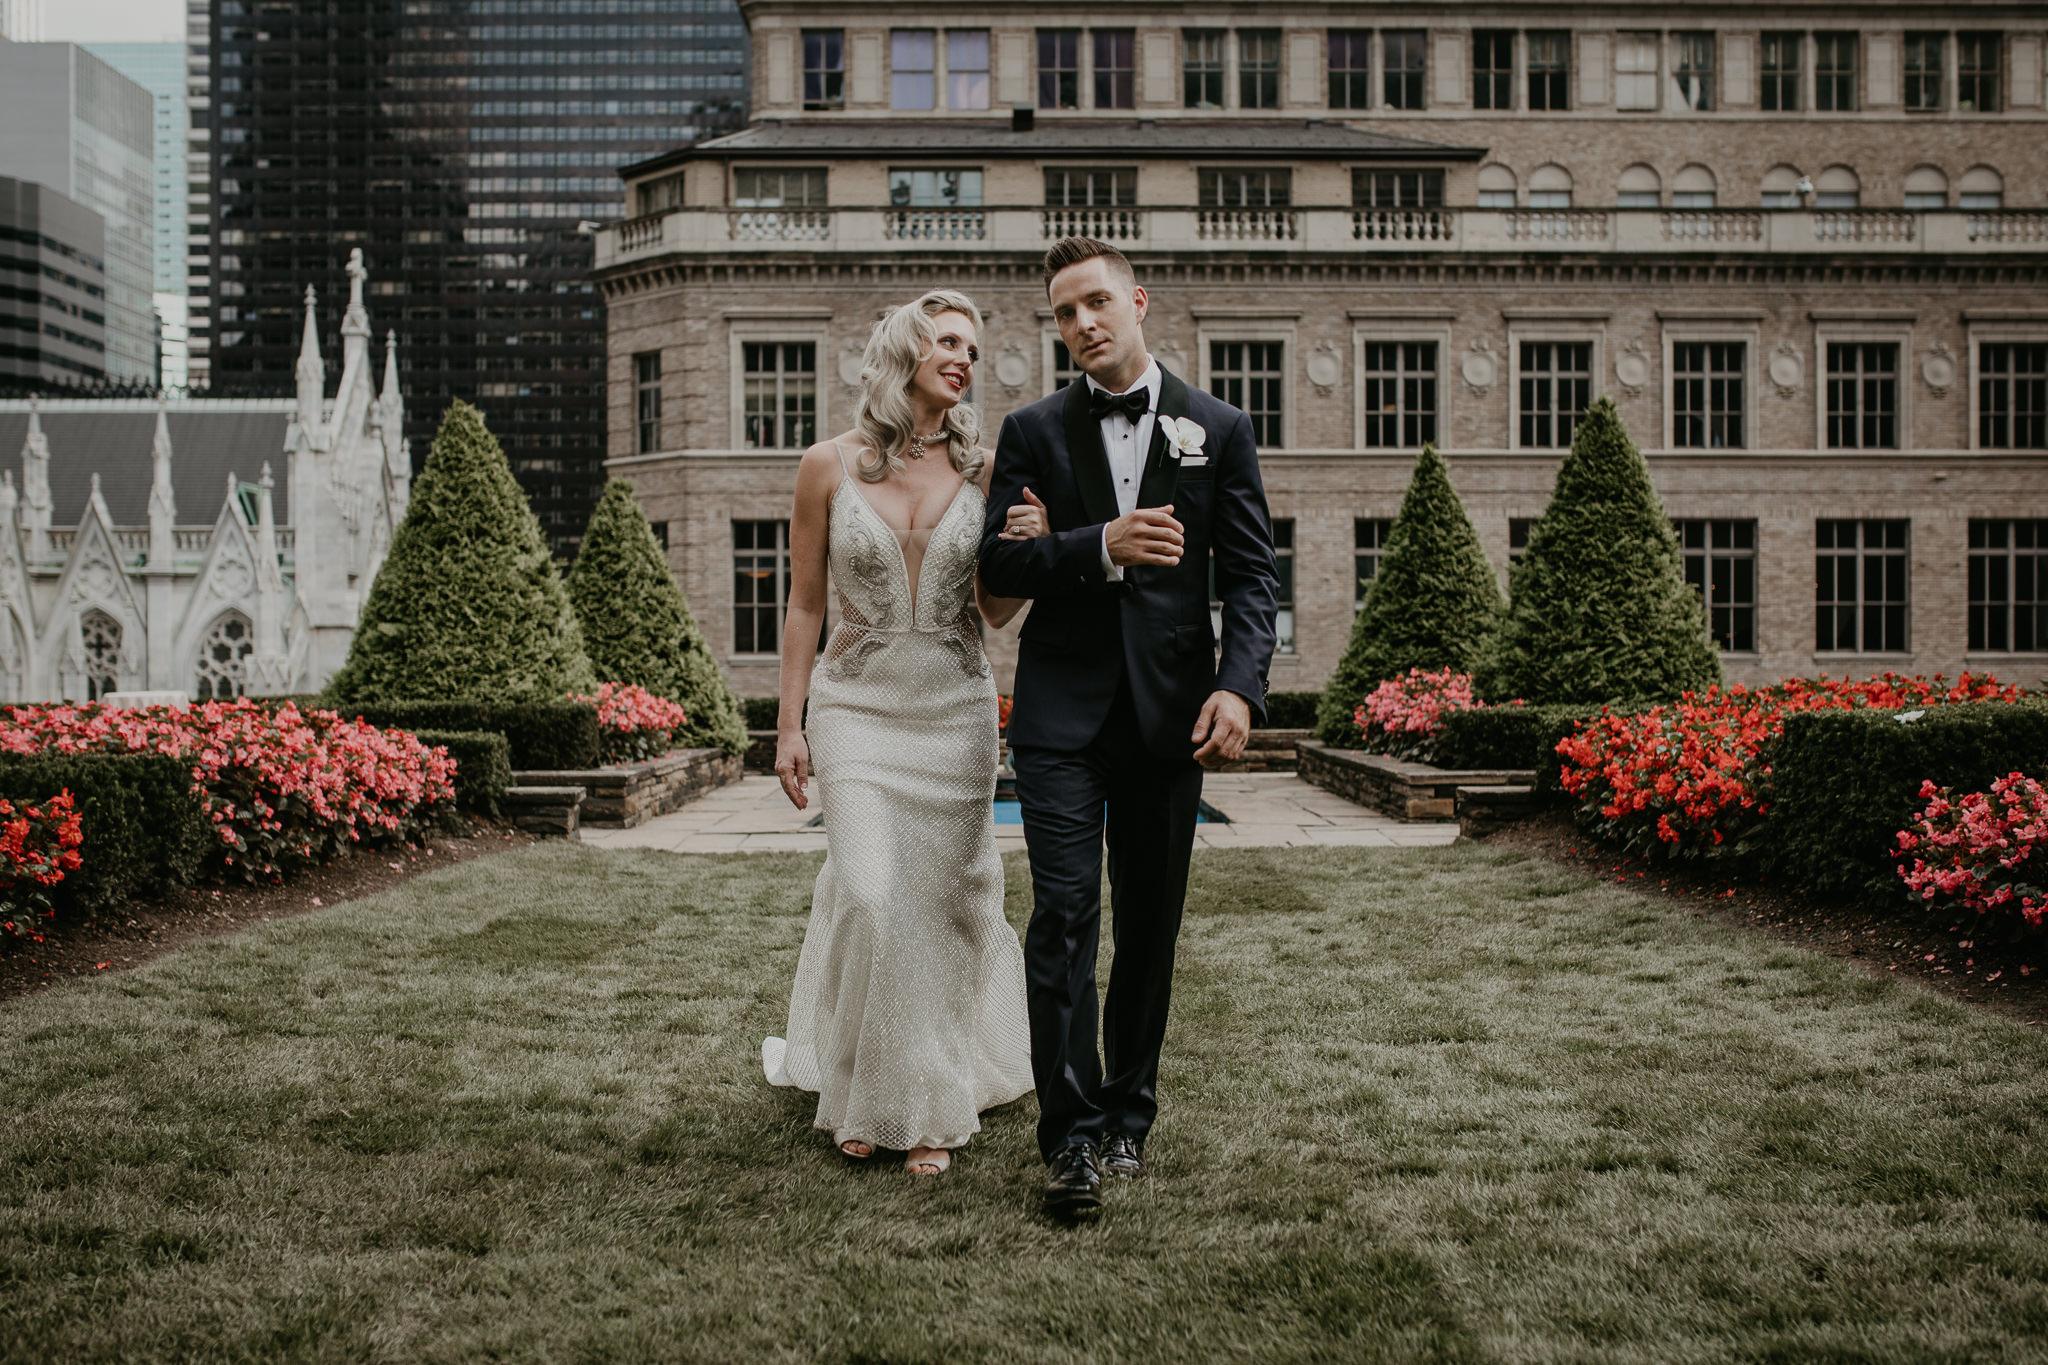 M+J_NYC_Wedding_StPatricks_30Rock_RainbowRoom_073.jpg